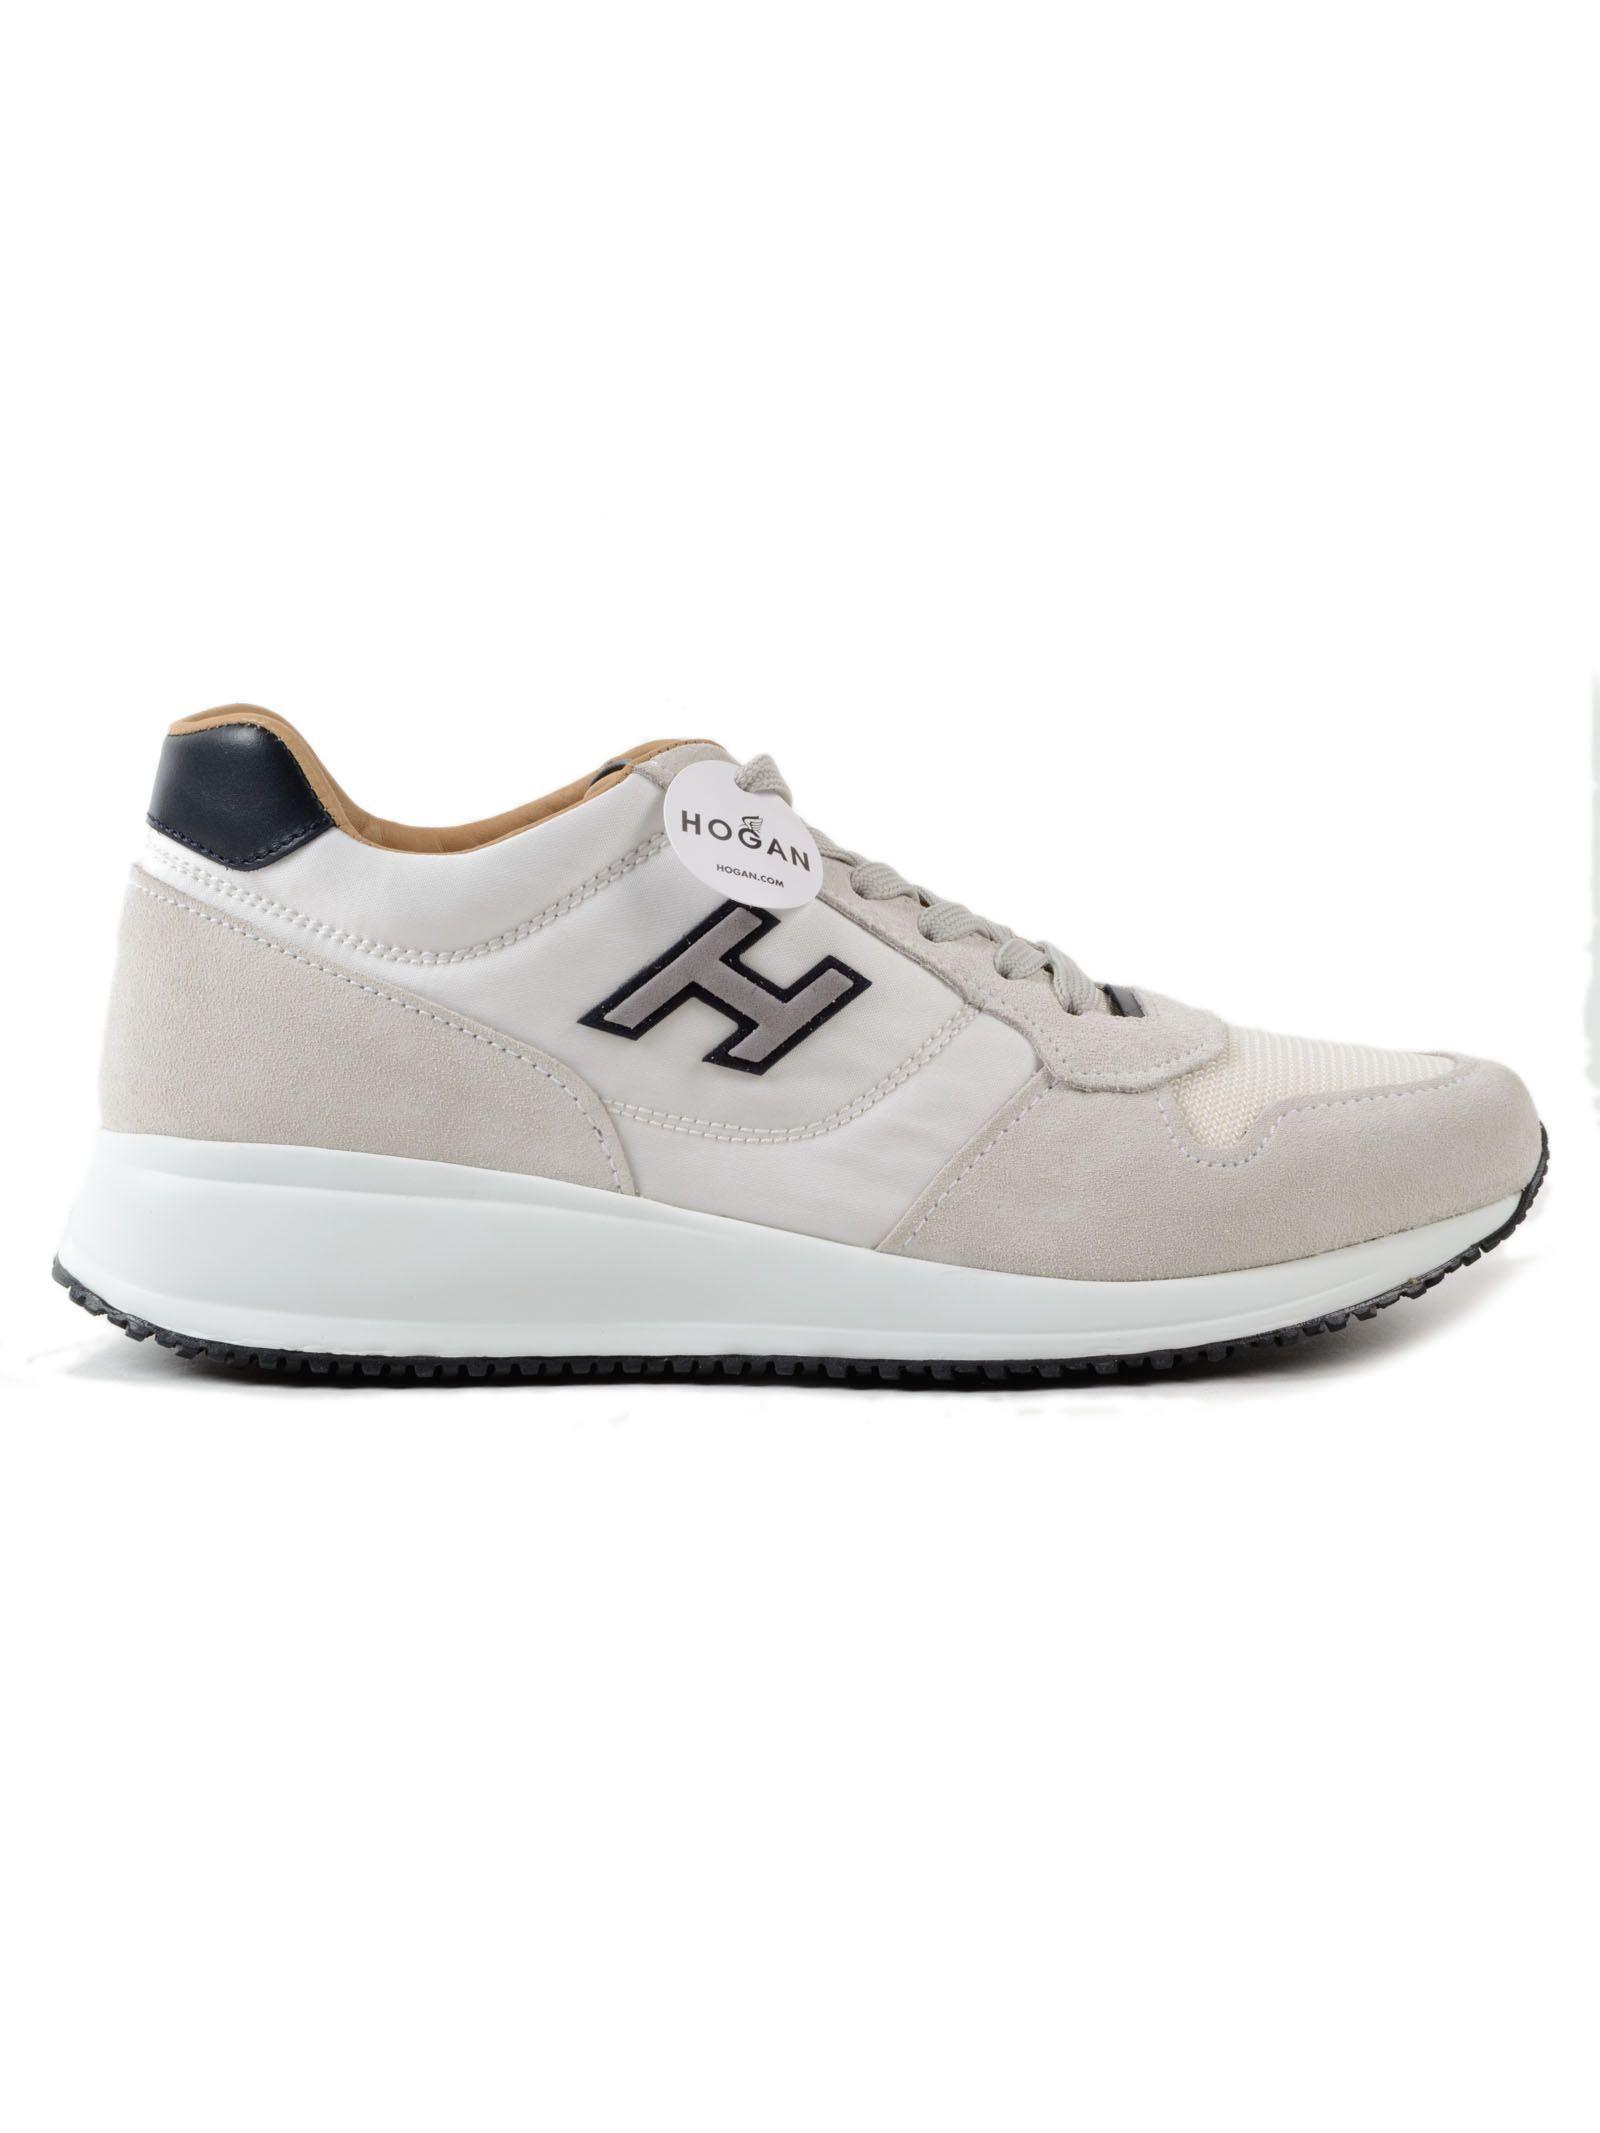 621bd2e752e54 HOGAN INTERACTIVE N20 SNEAKER.  hogan  shoes